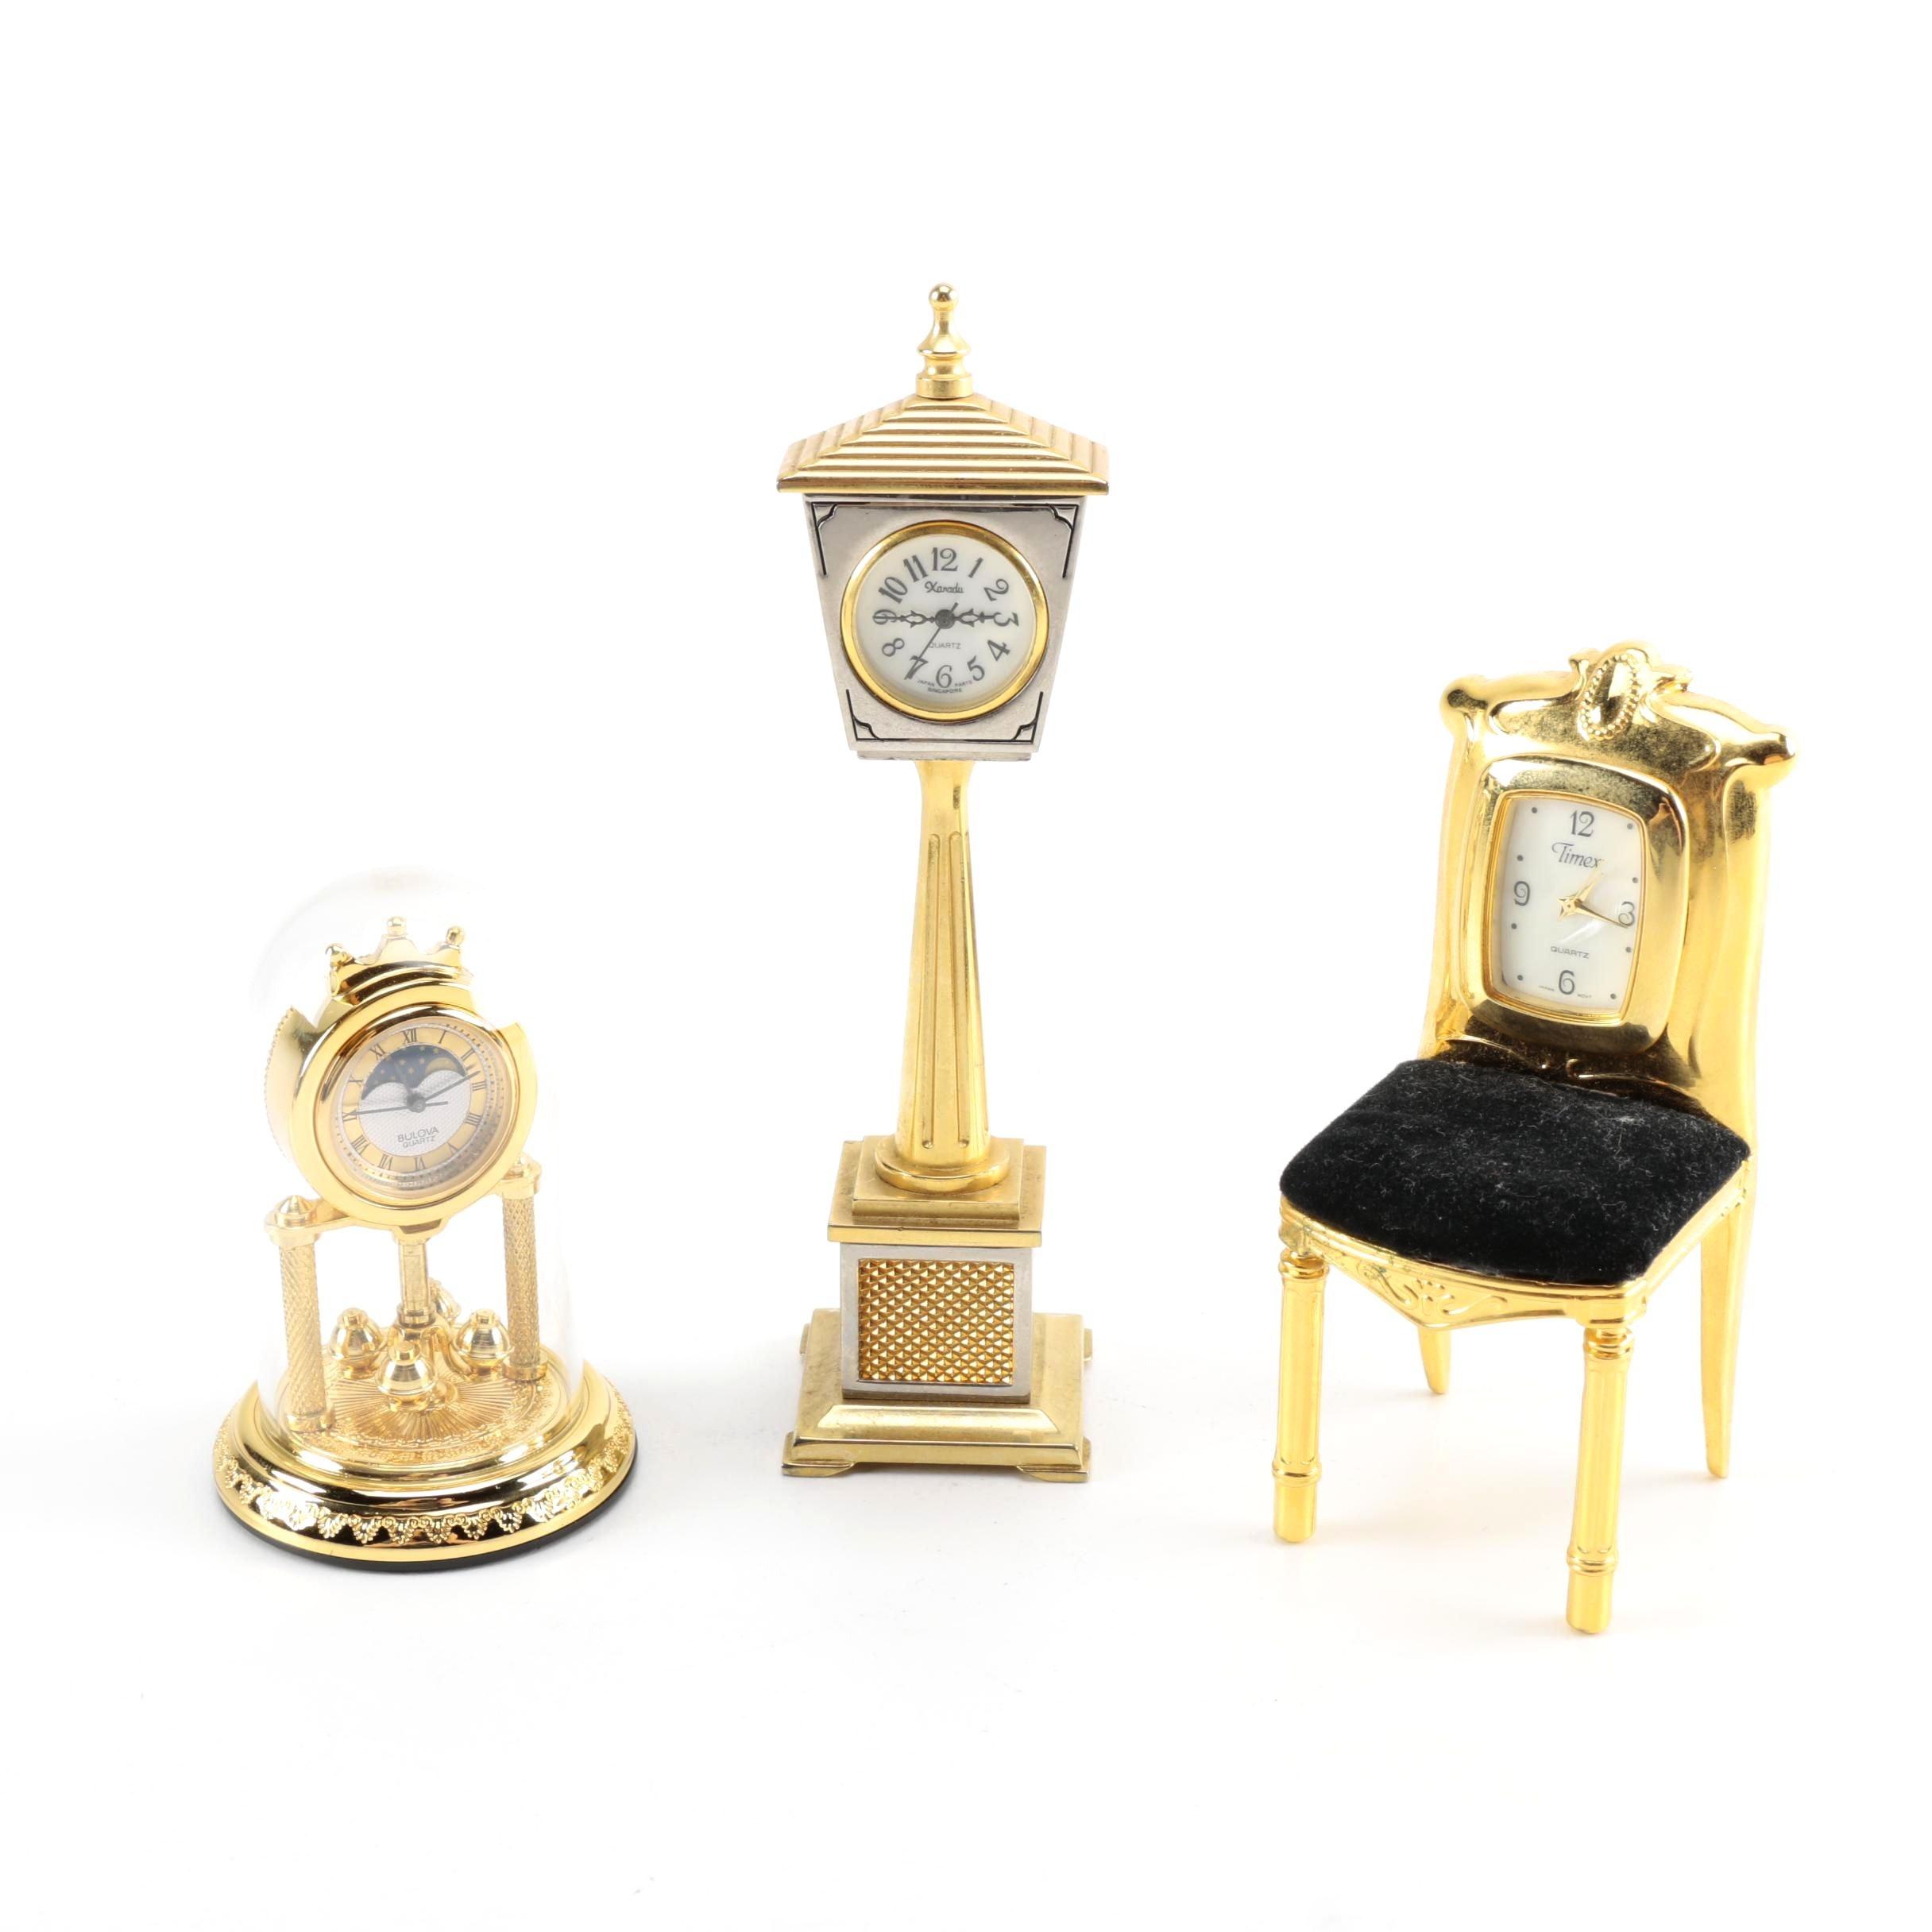 Small Model Clocks